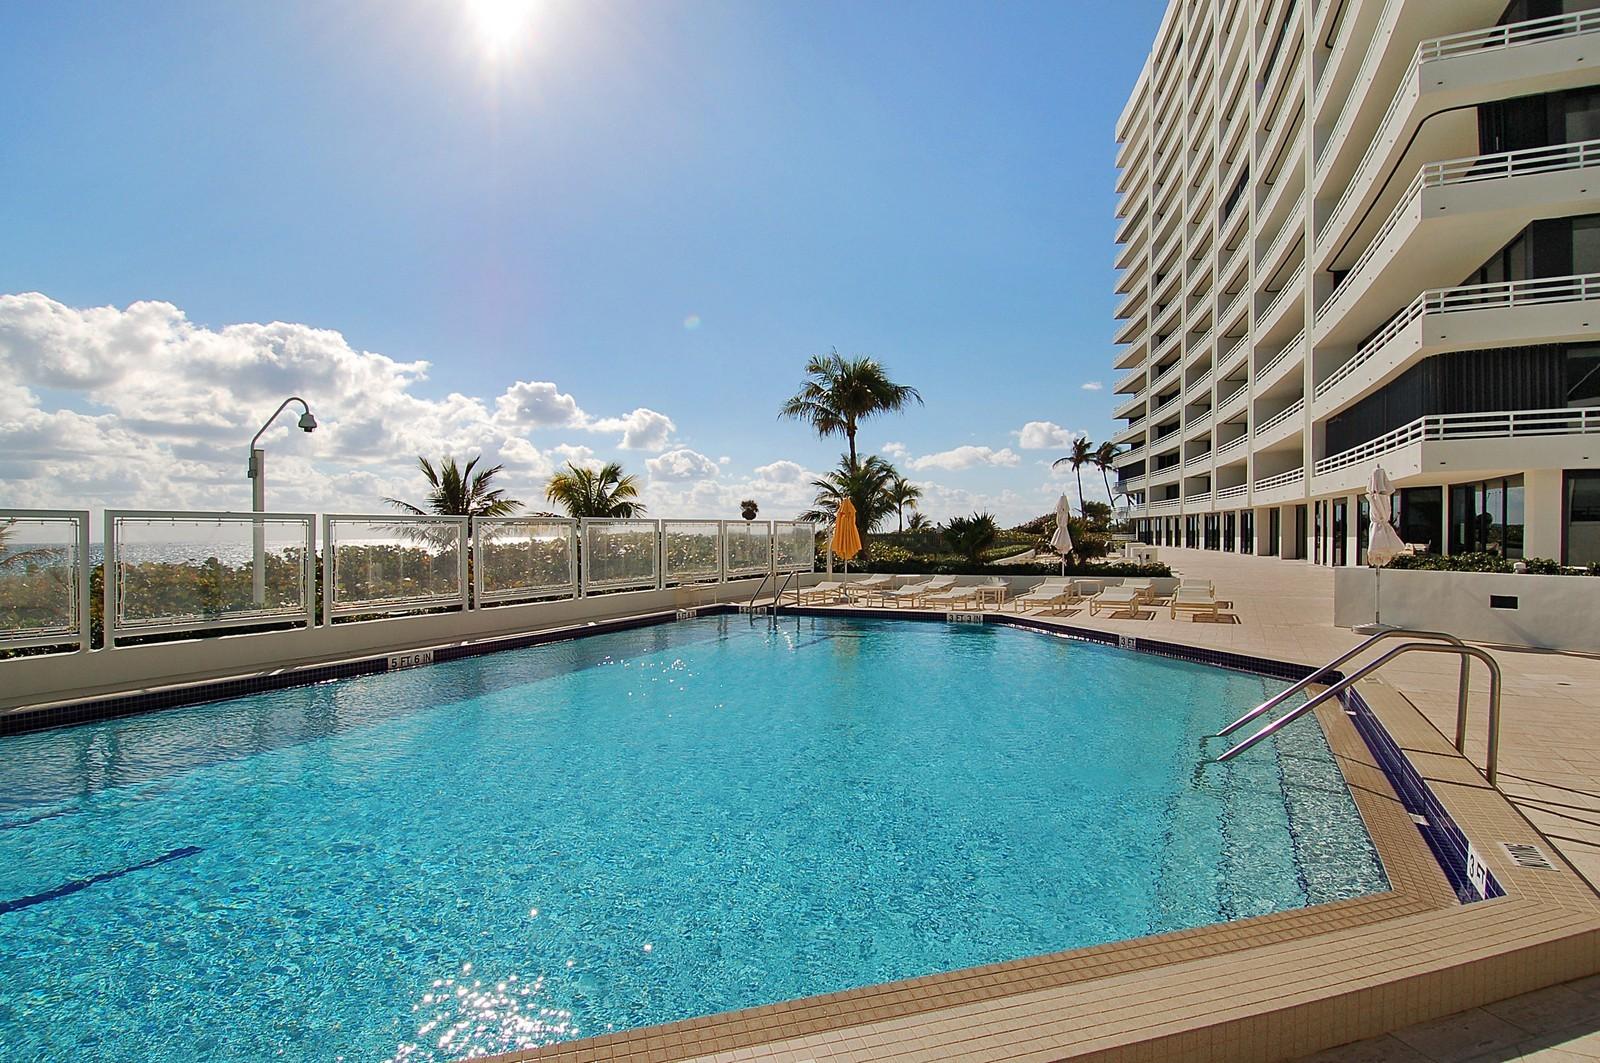 Real Estate Photography - 1500 S Ocean, Unit S-1101, Boca Raton, FL, 33432 - Location 7